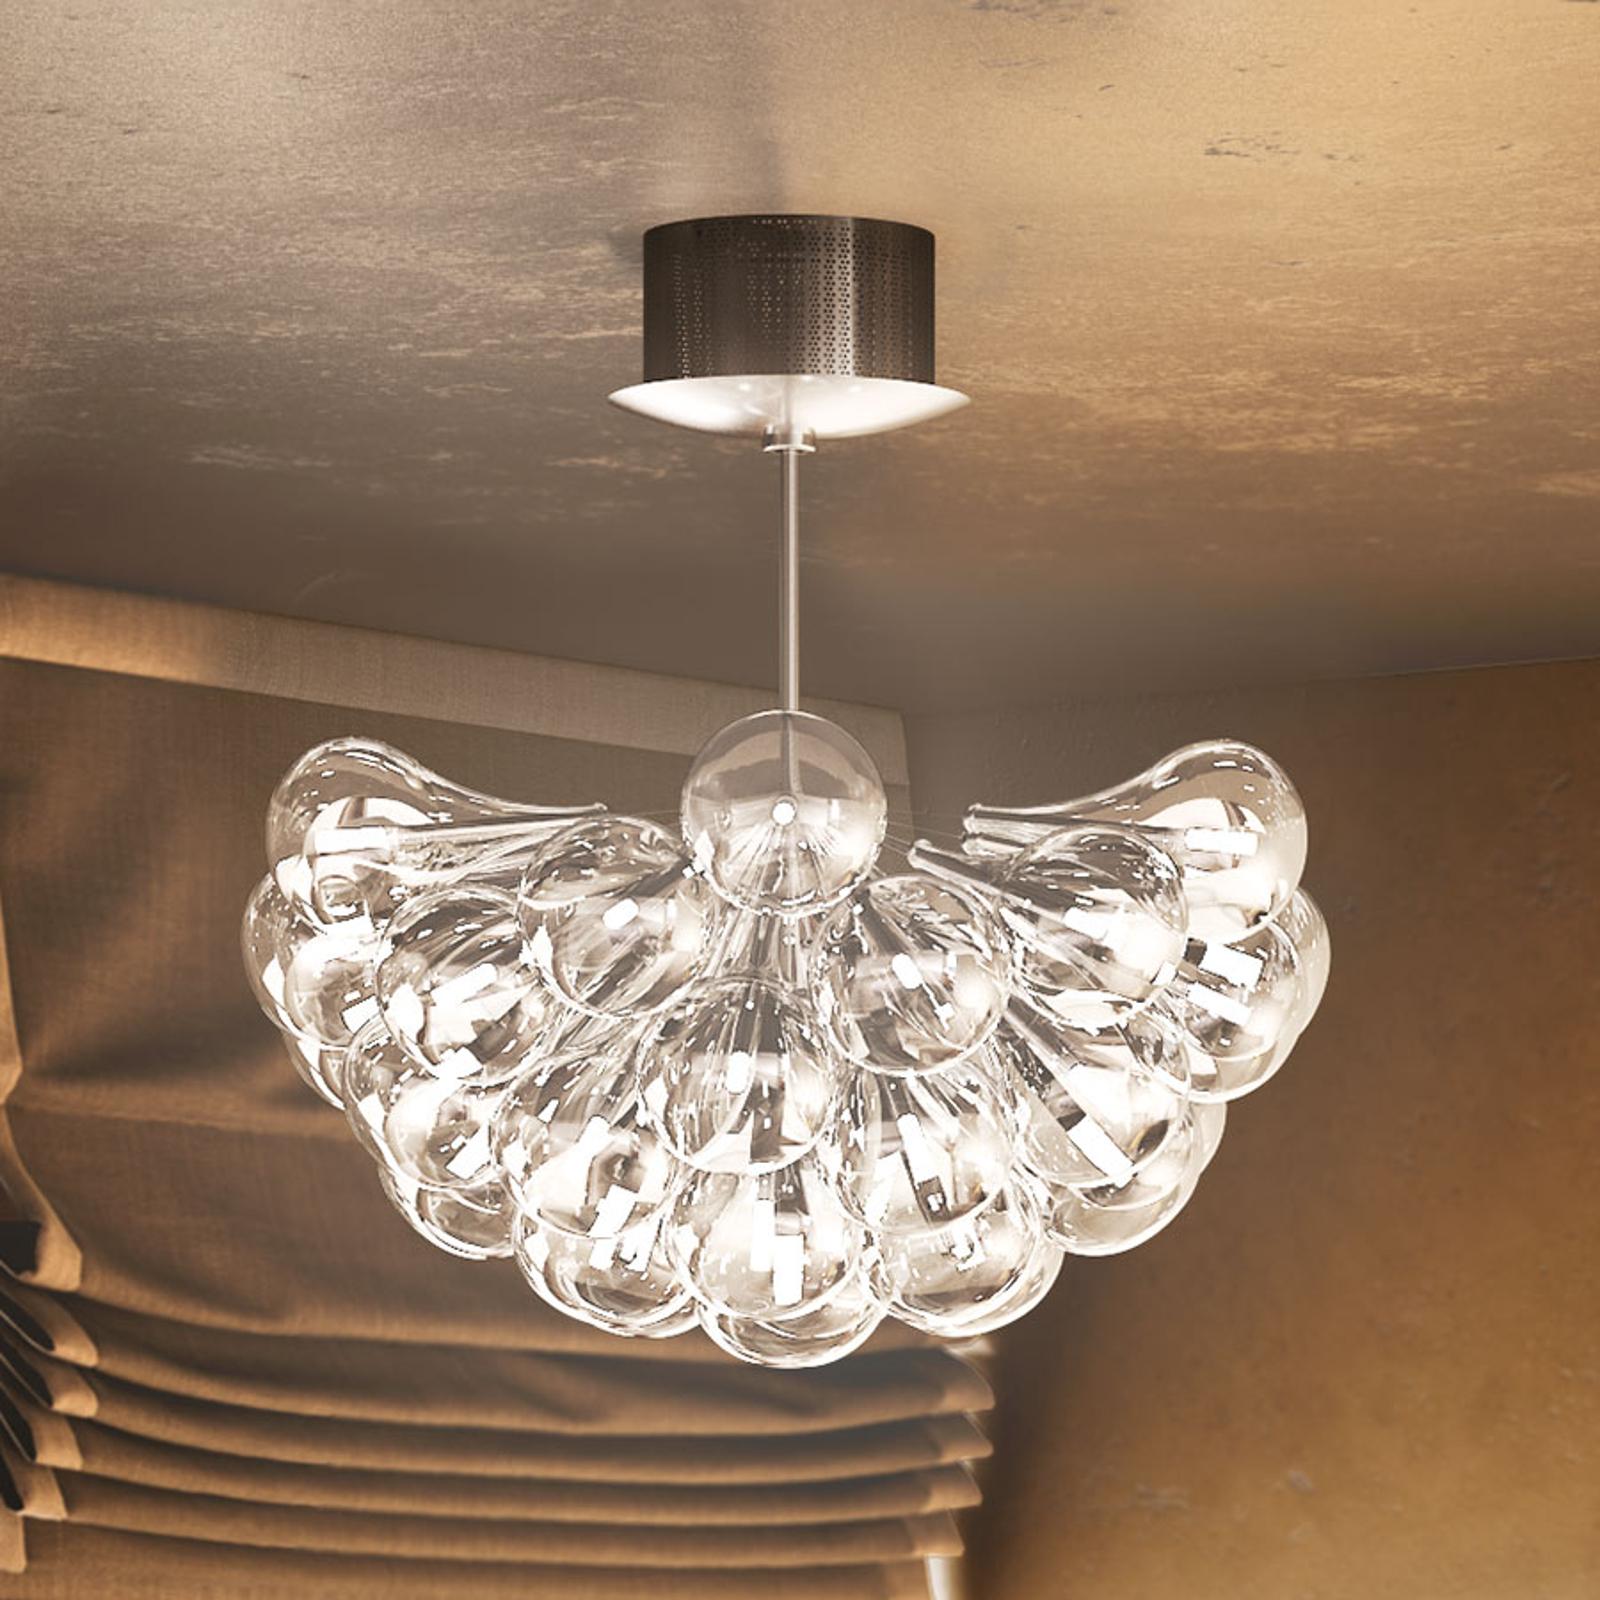 Acquista Lampada LED sospensione Drop S, 37 luci